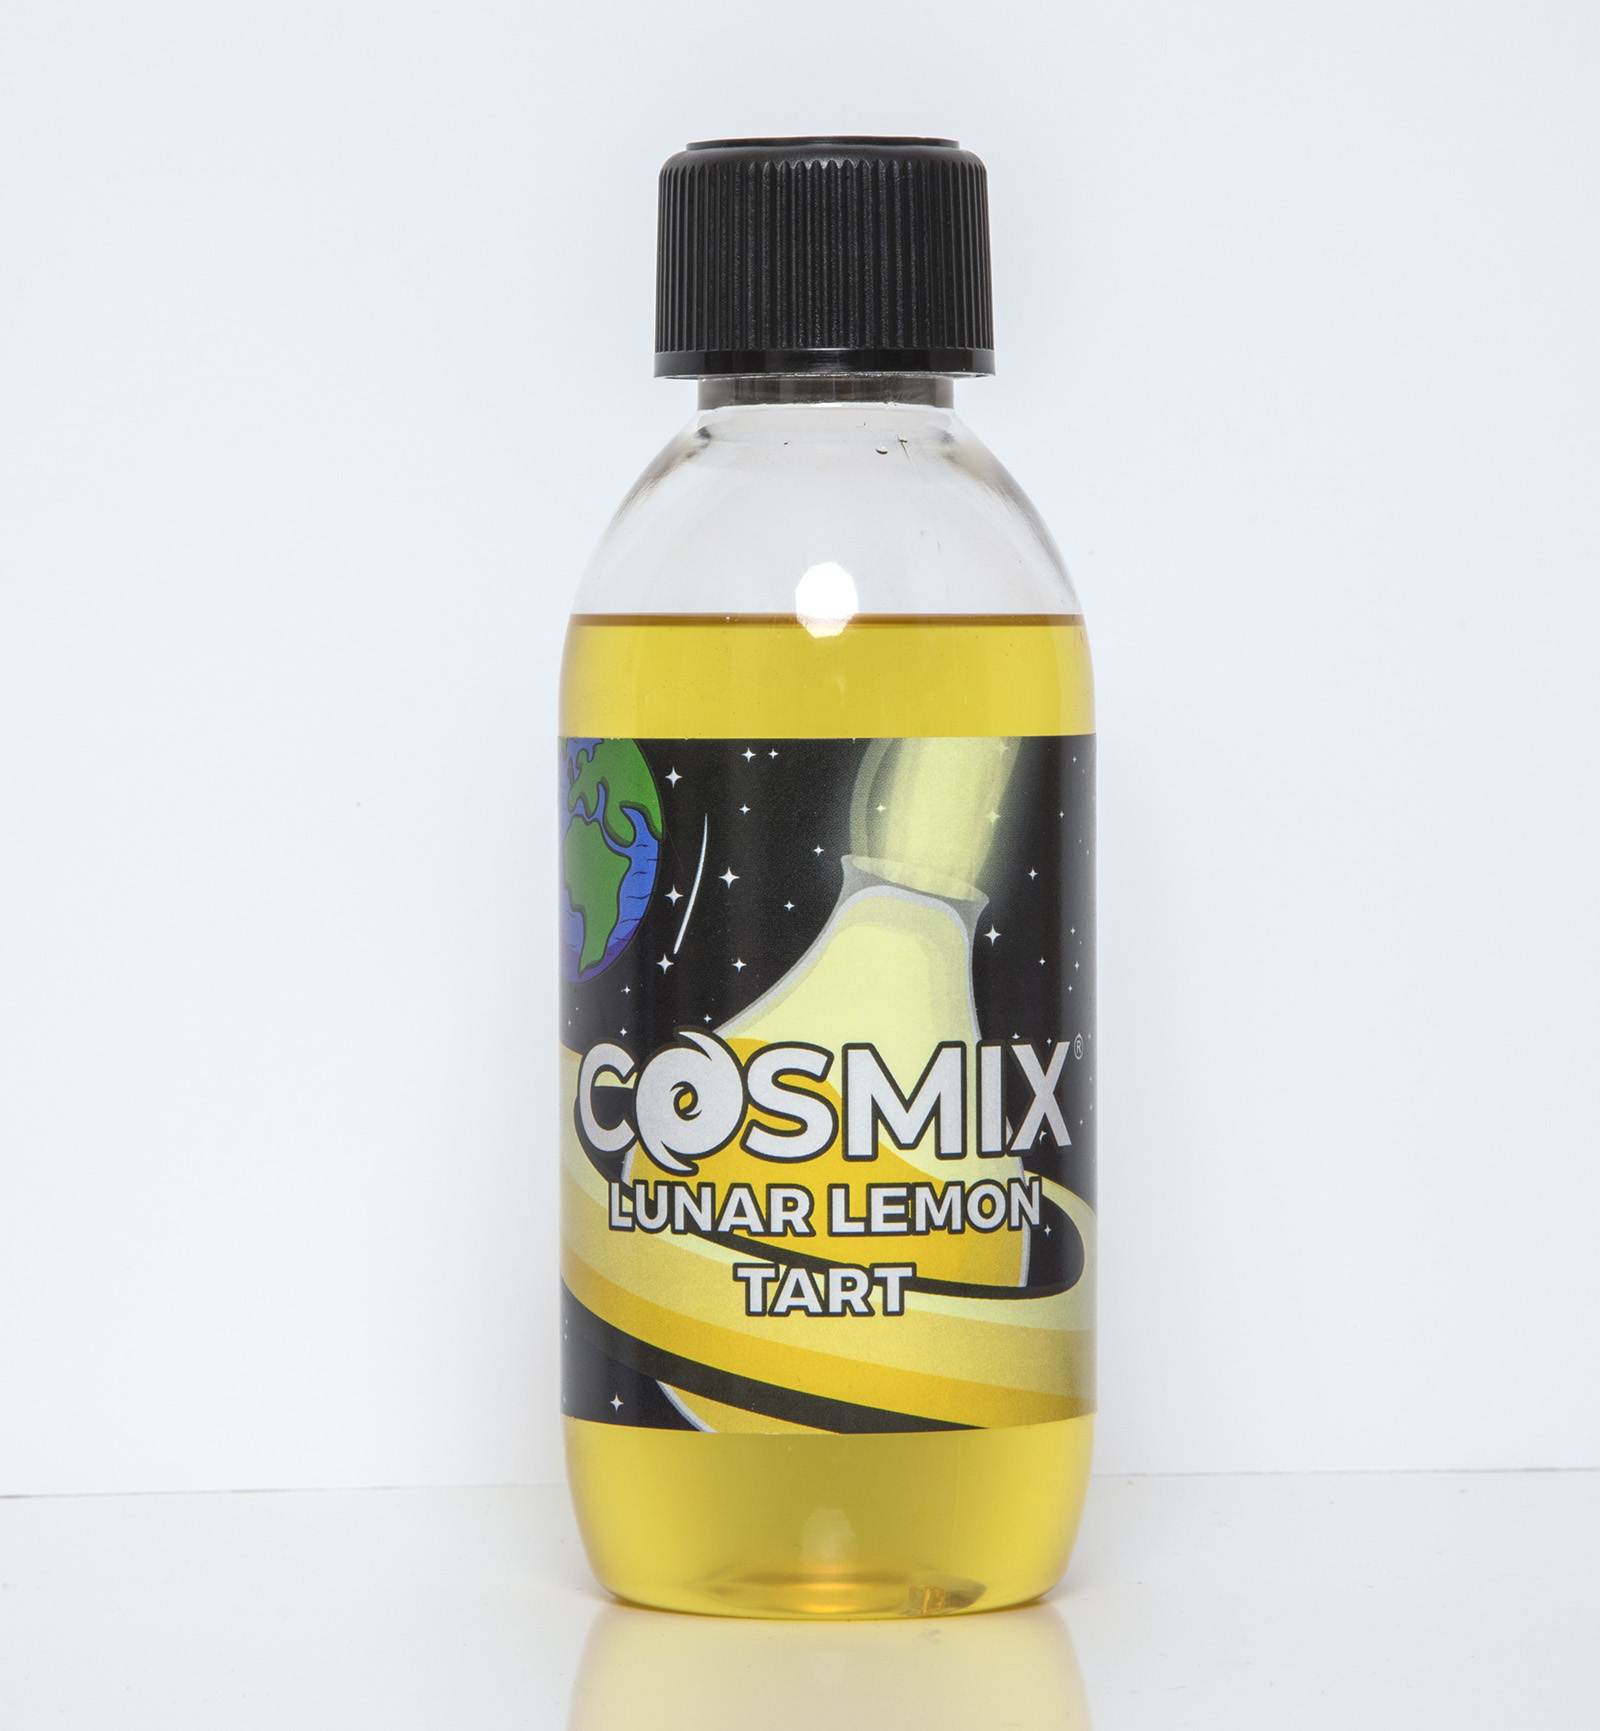 Cosmix-Lunar-Lemon-Tart-1.jpg